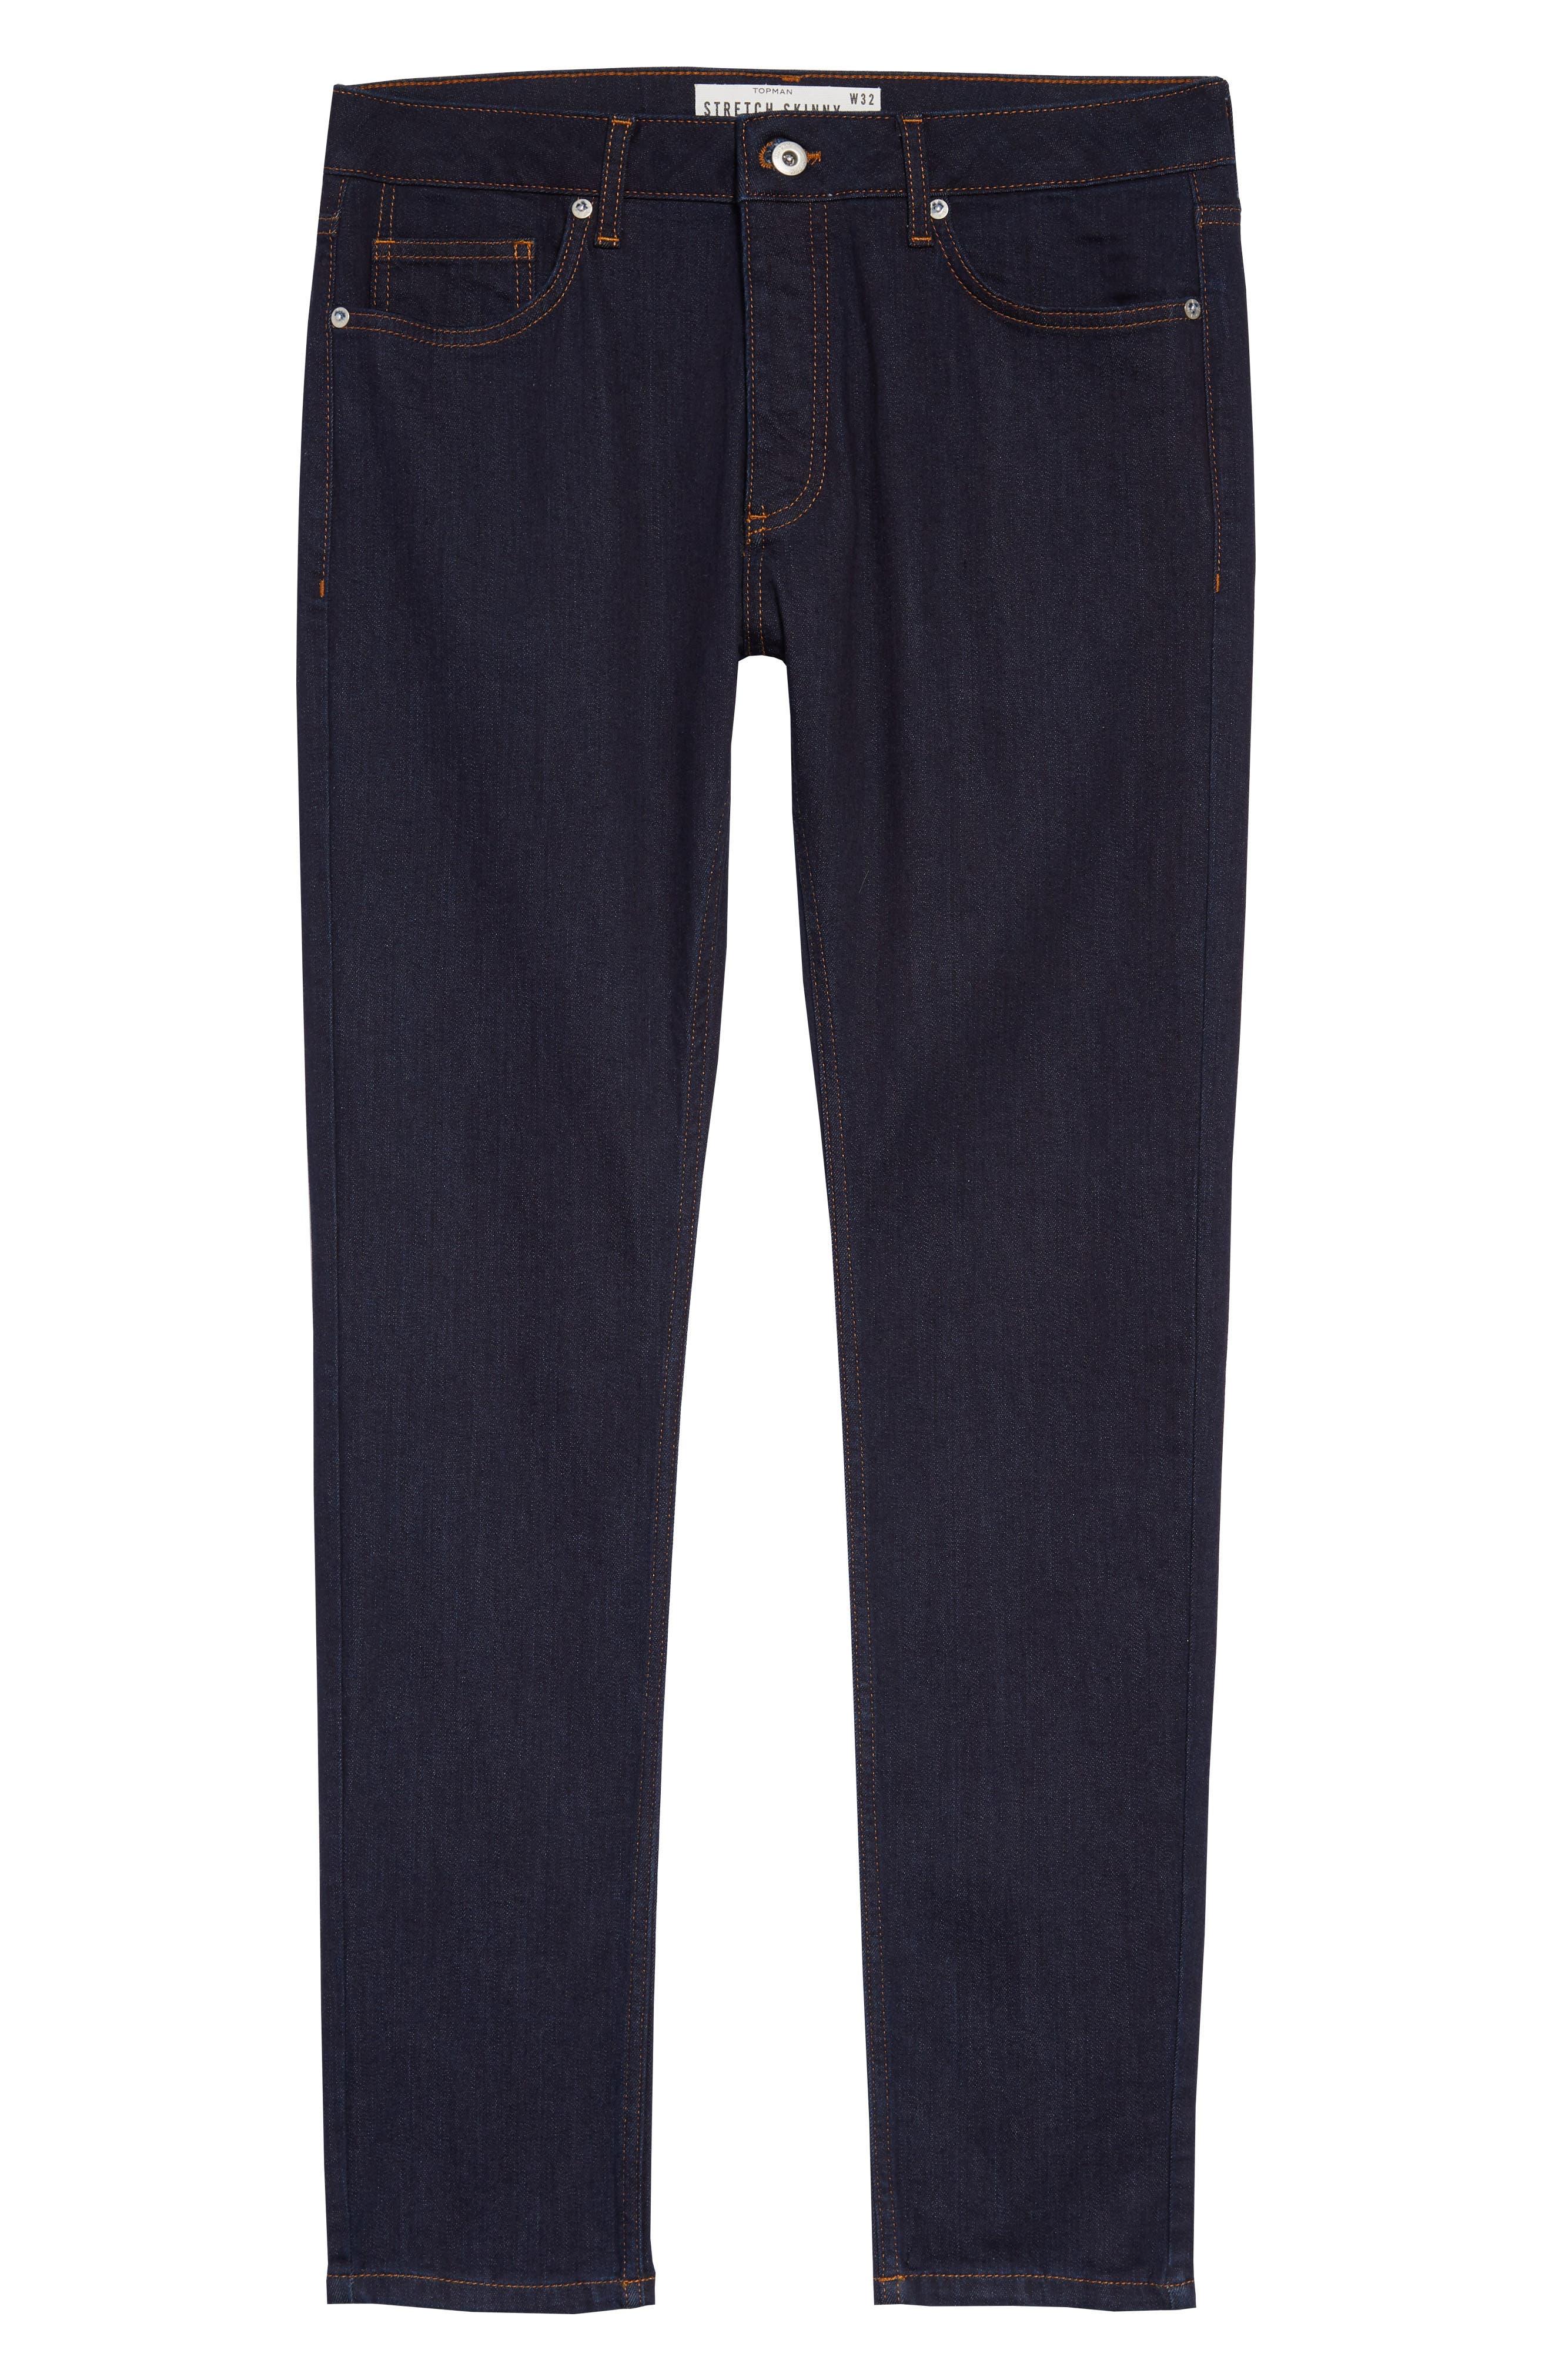 TOPMAN, Stretch Skinny Fit Raw Denim Jeans, Alternate thumbnail 5, color, BLUE